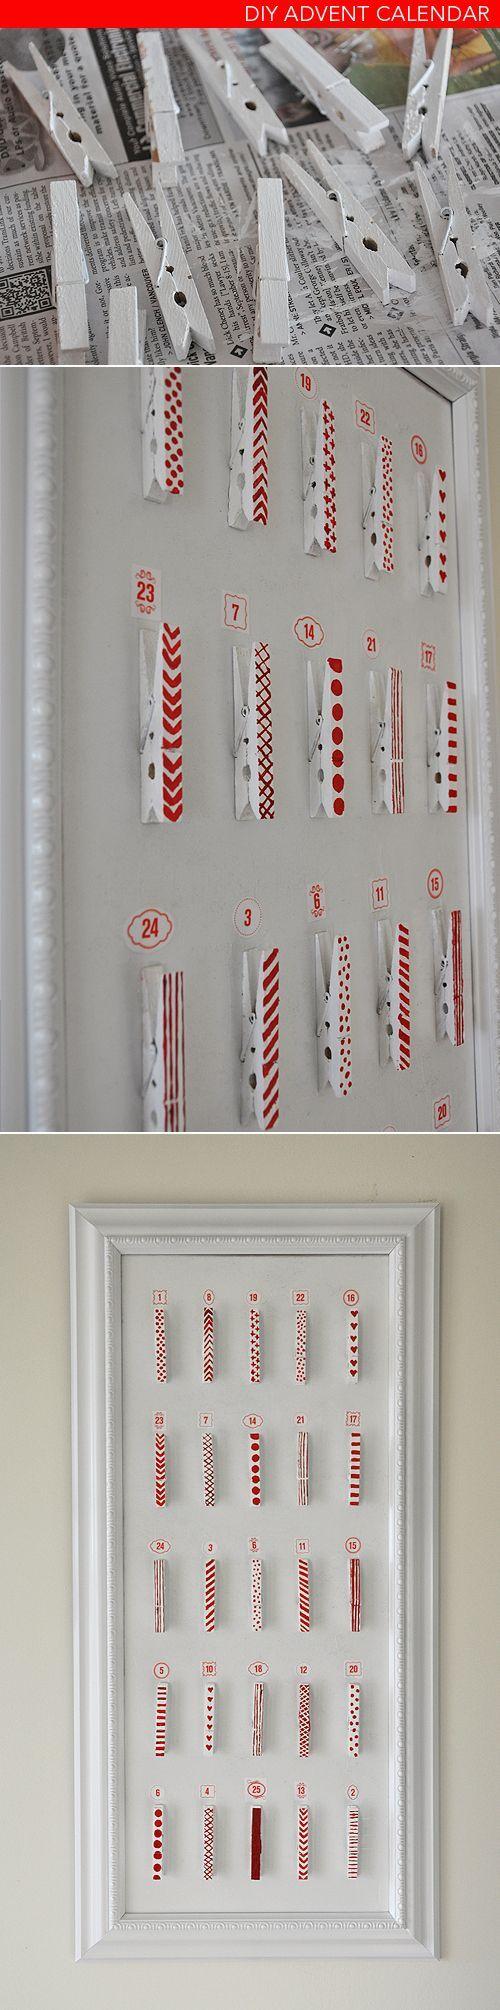 Another lovely DIY idea for an advent calendar with clothes pegs!  Underbar DIY adventkalender med klädnypor!